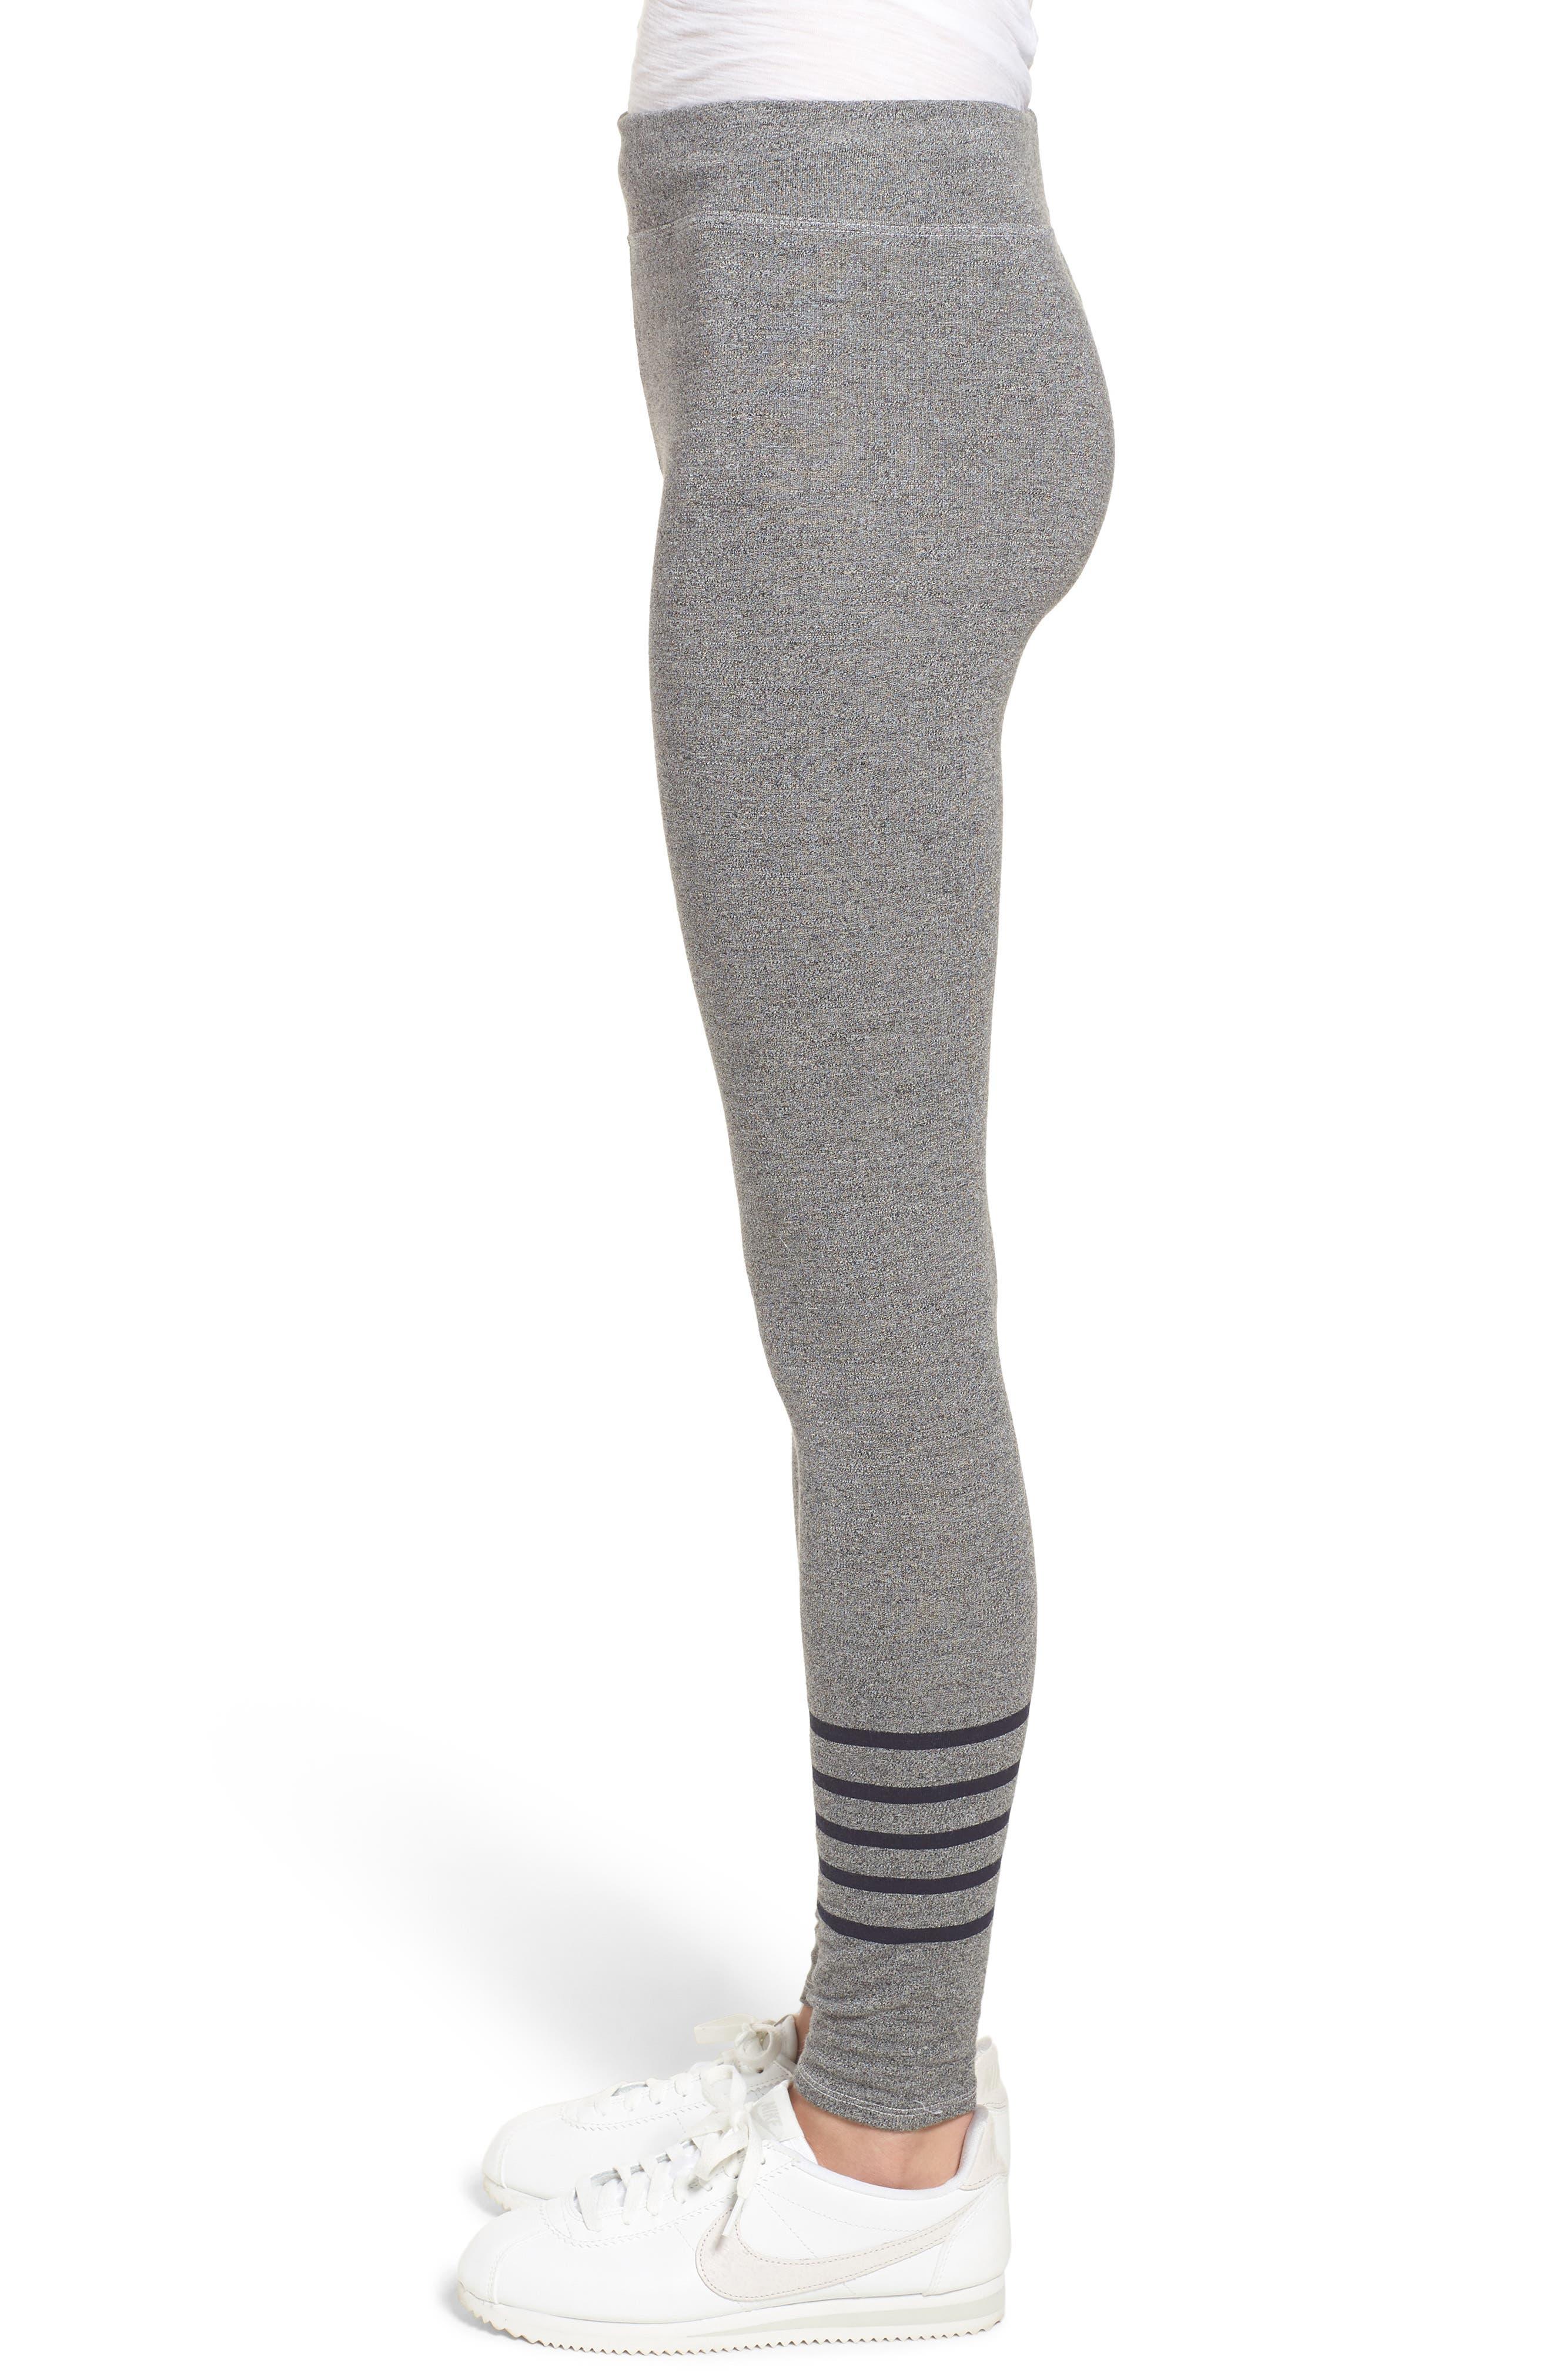 Stripe Yoga Pants,                             Alternate thumbnail 3, color,                             Heather Grey